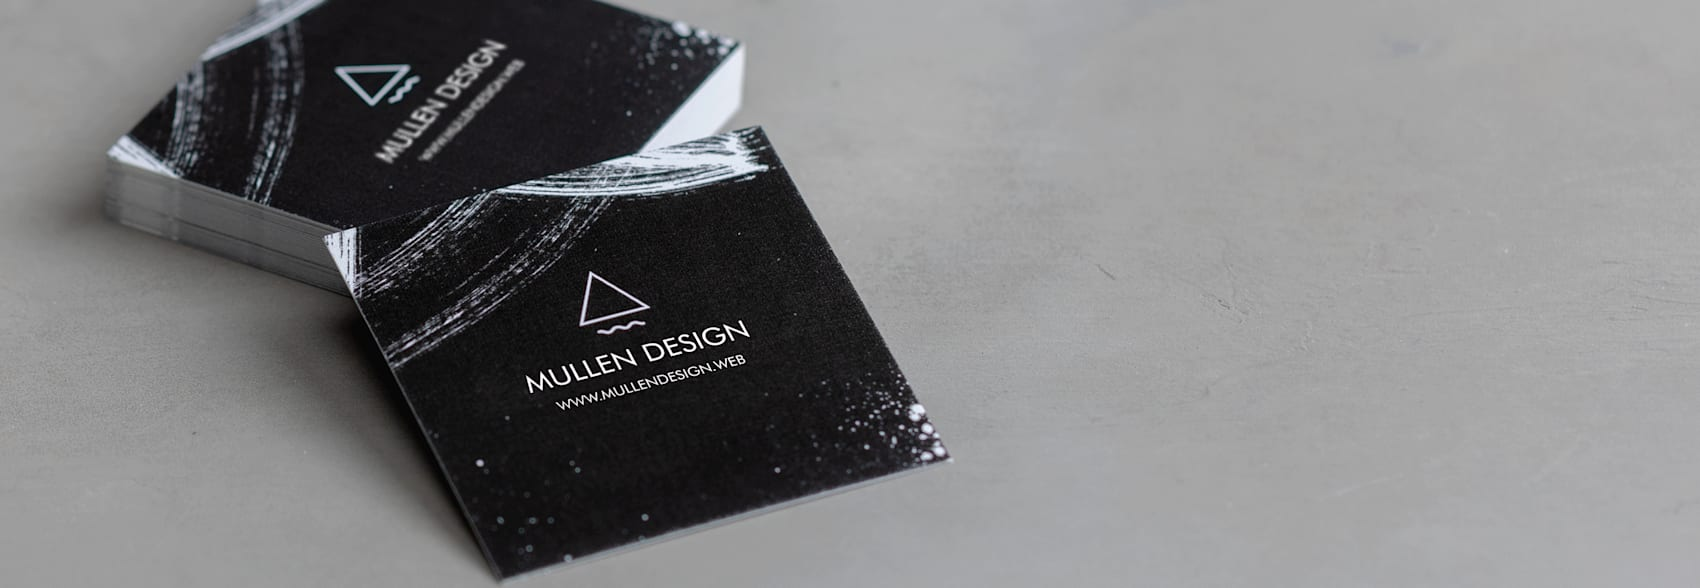 square business cards size 65 x 65 mm  vistaprint